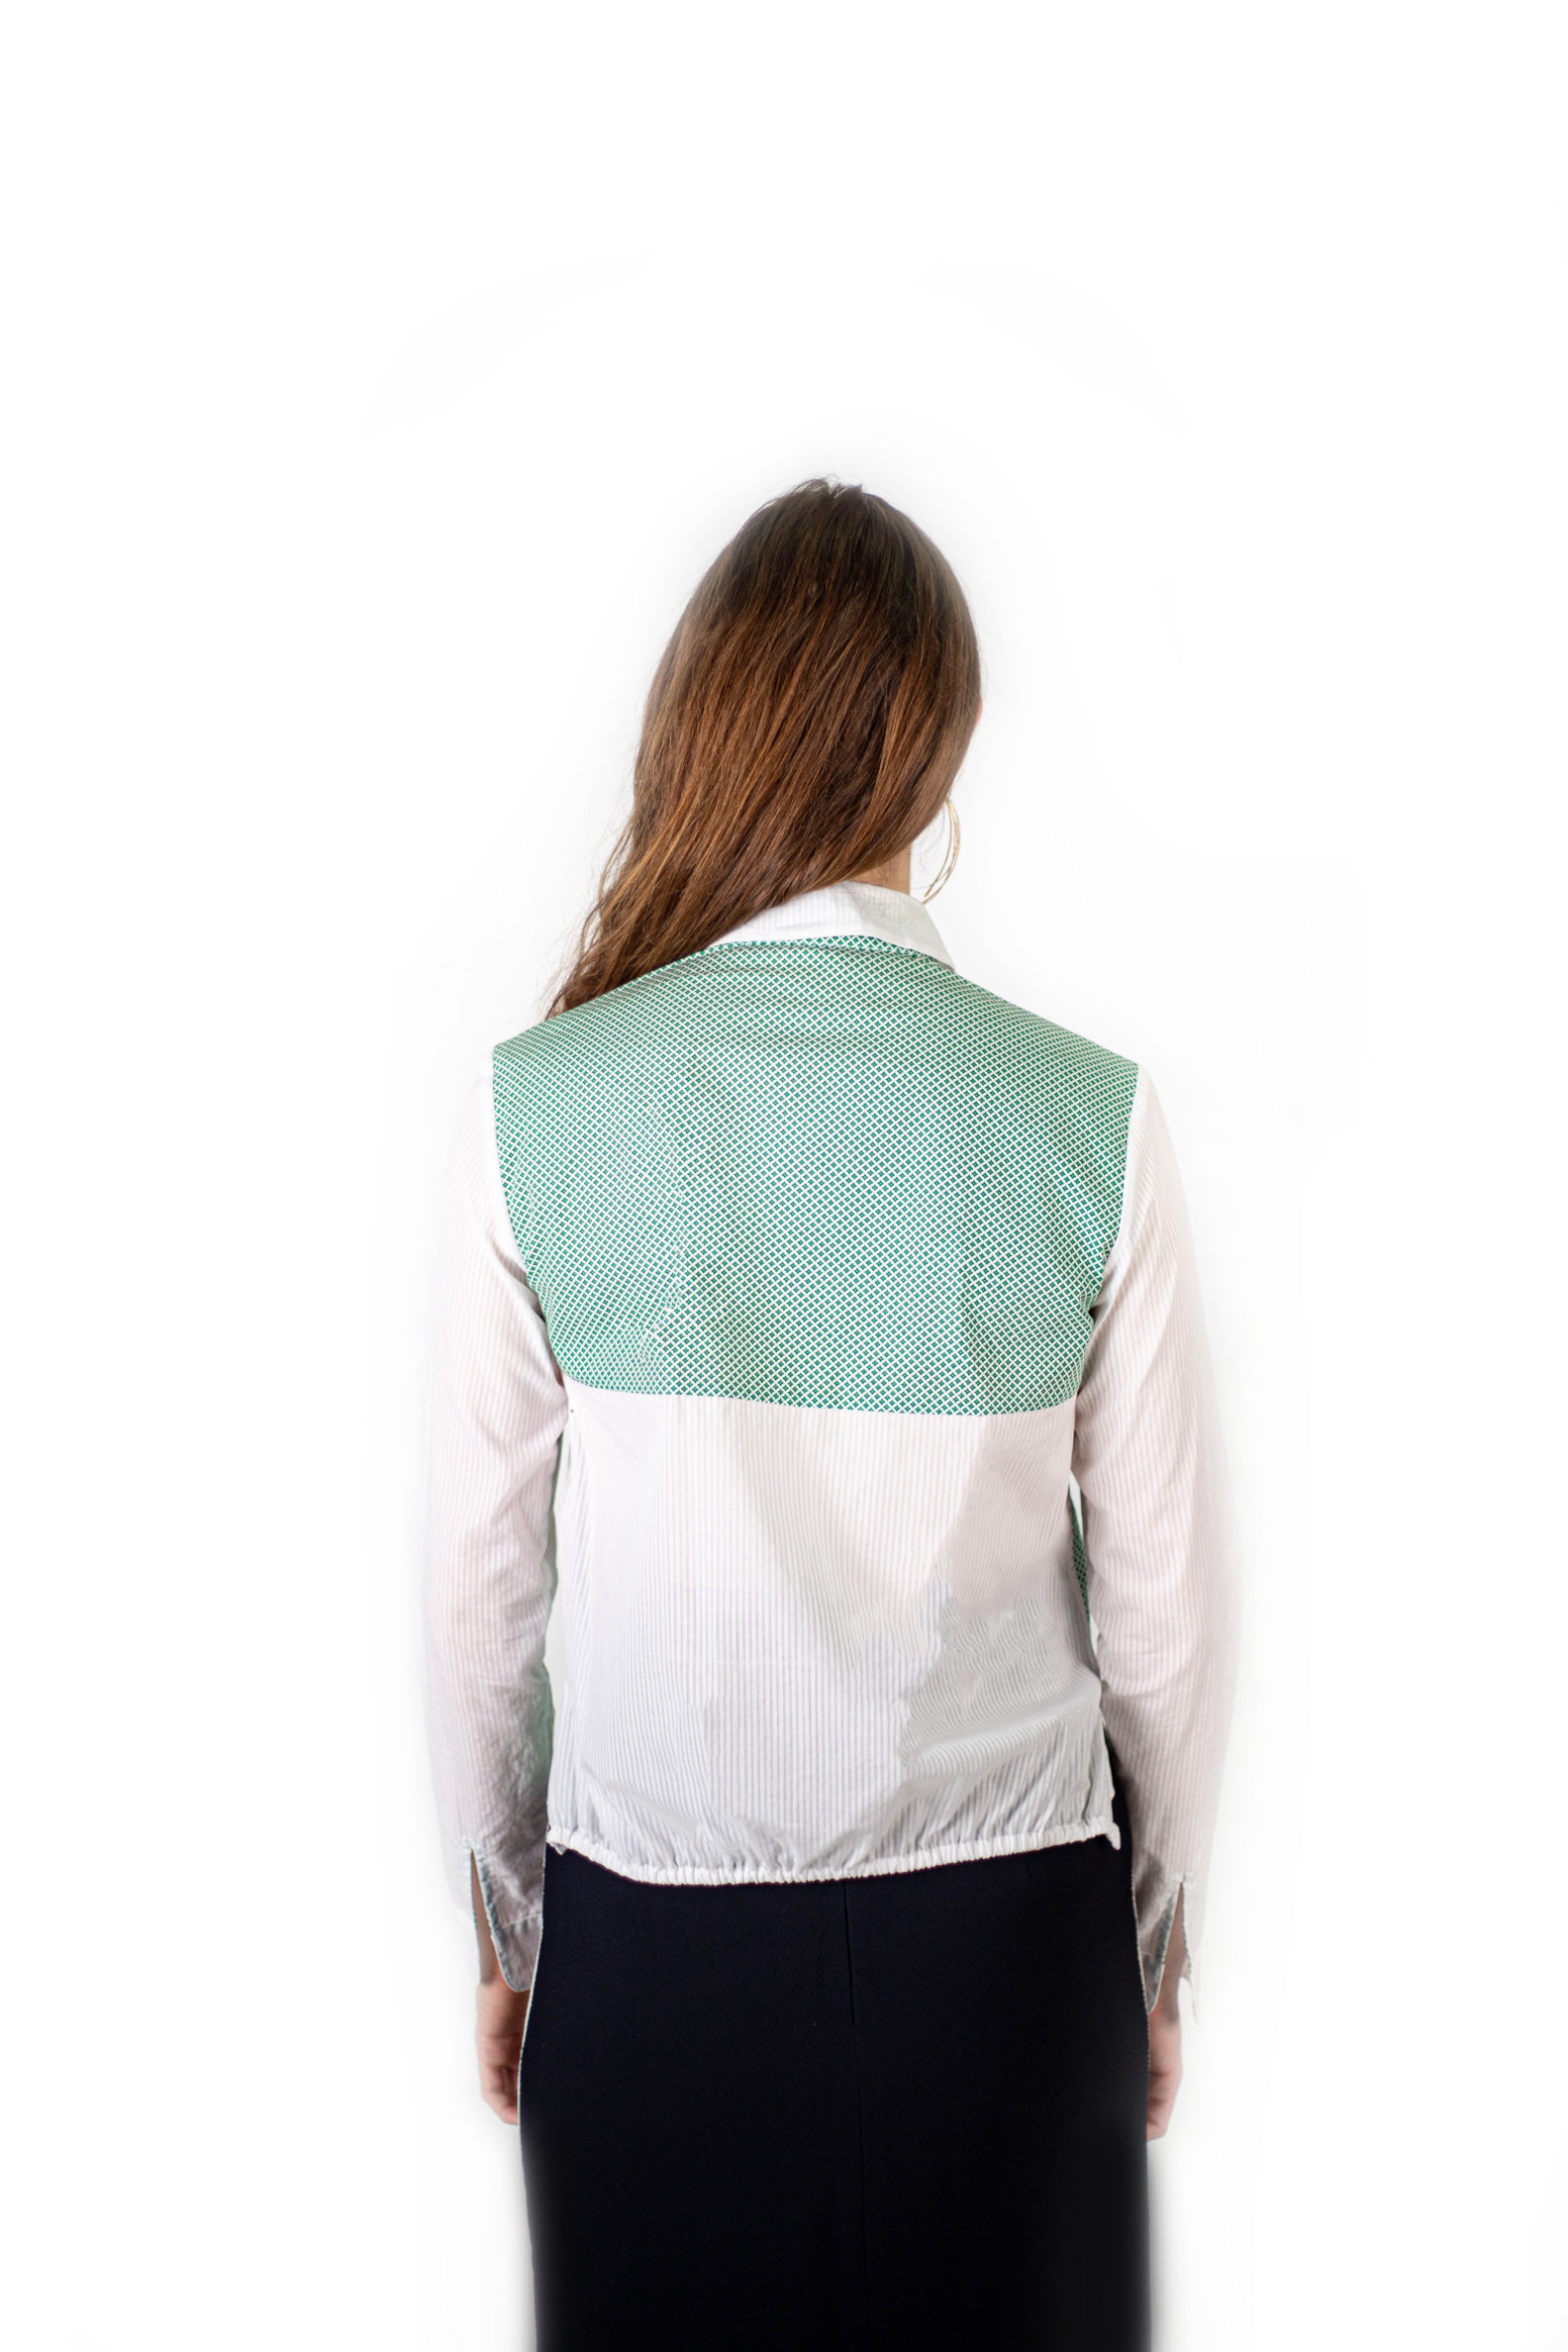 4-chemise-femme-bicolore-affaires-etrangeres-camille-wagner